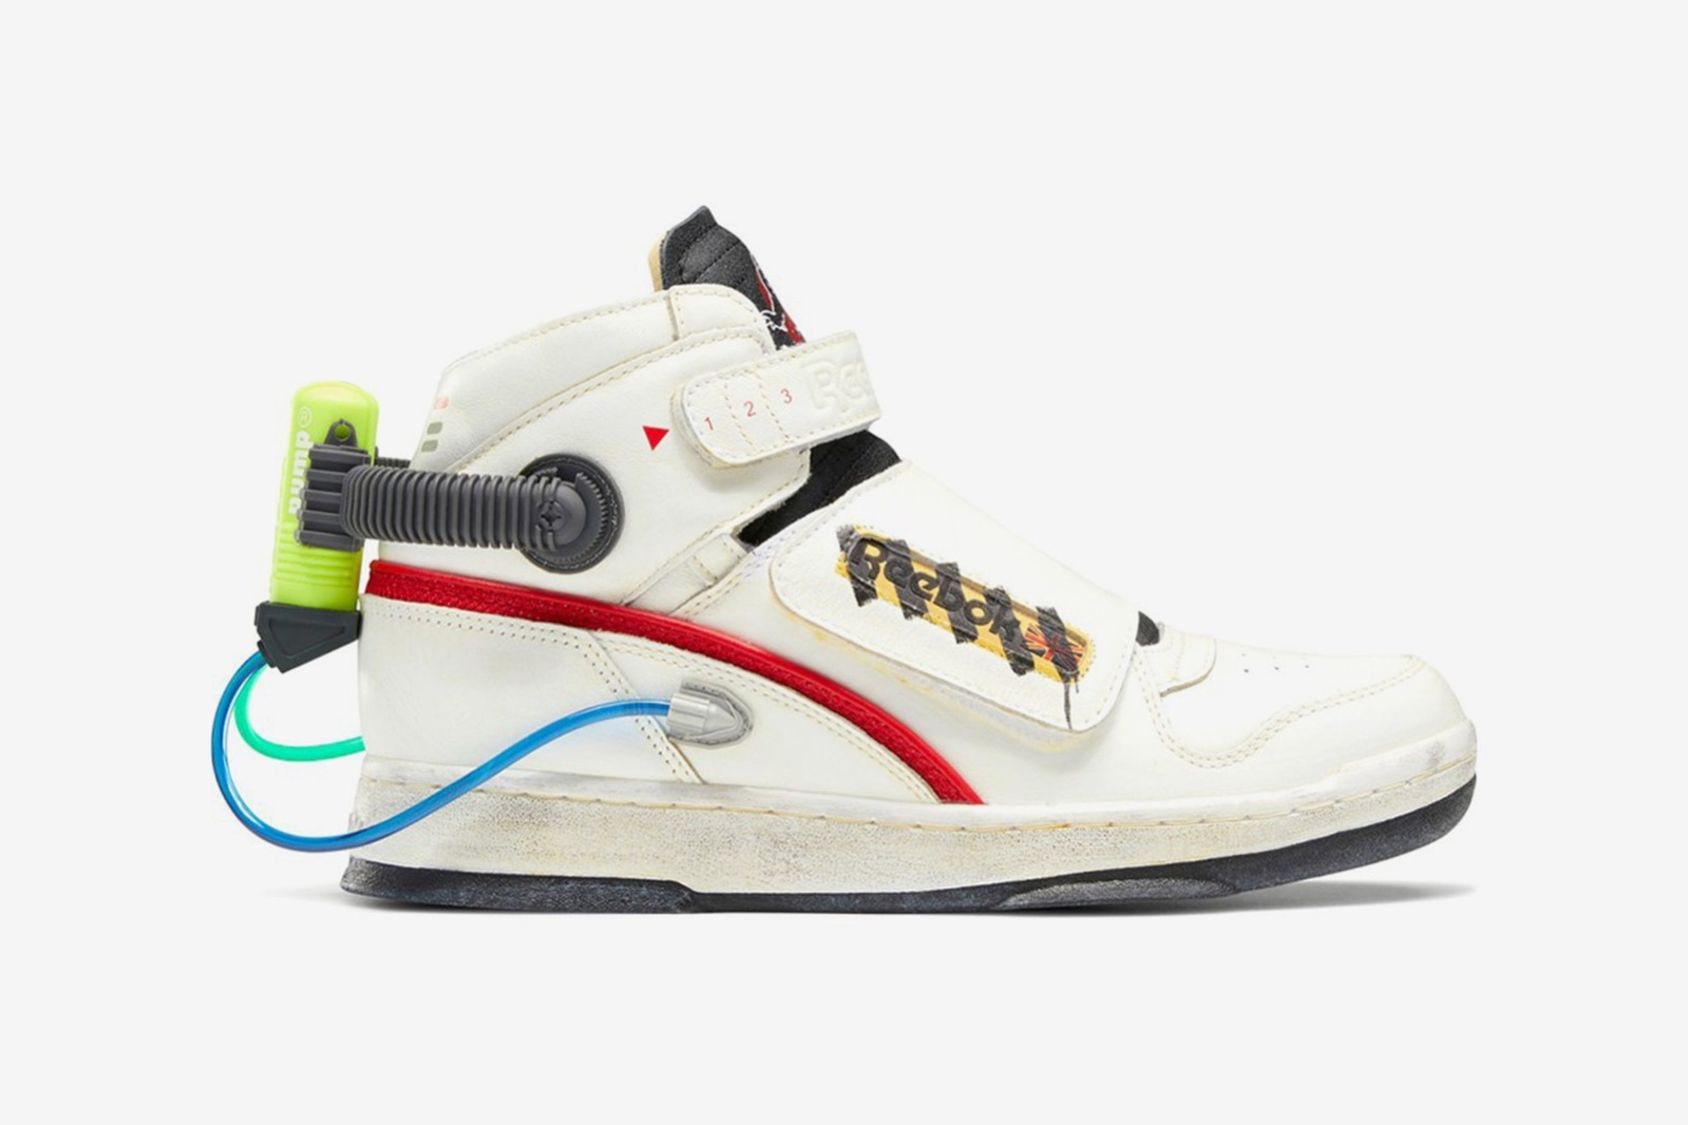 Ghostbusters-skor från Reebok